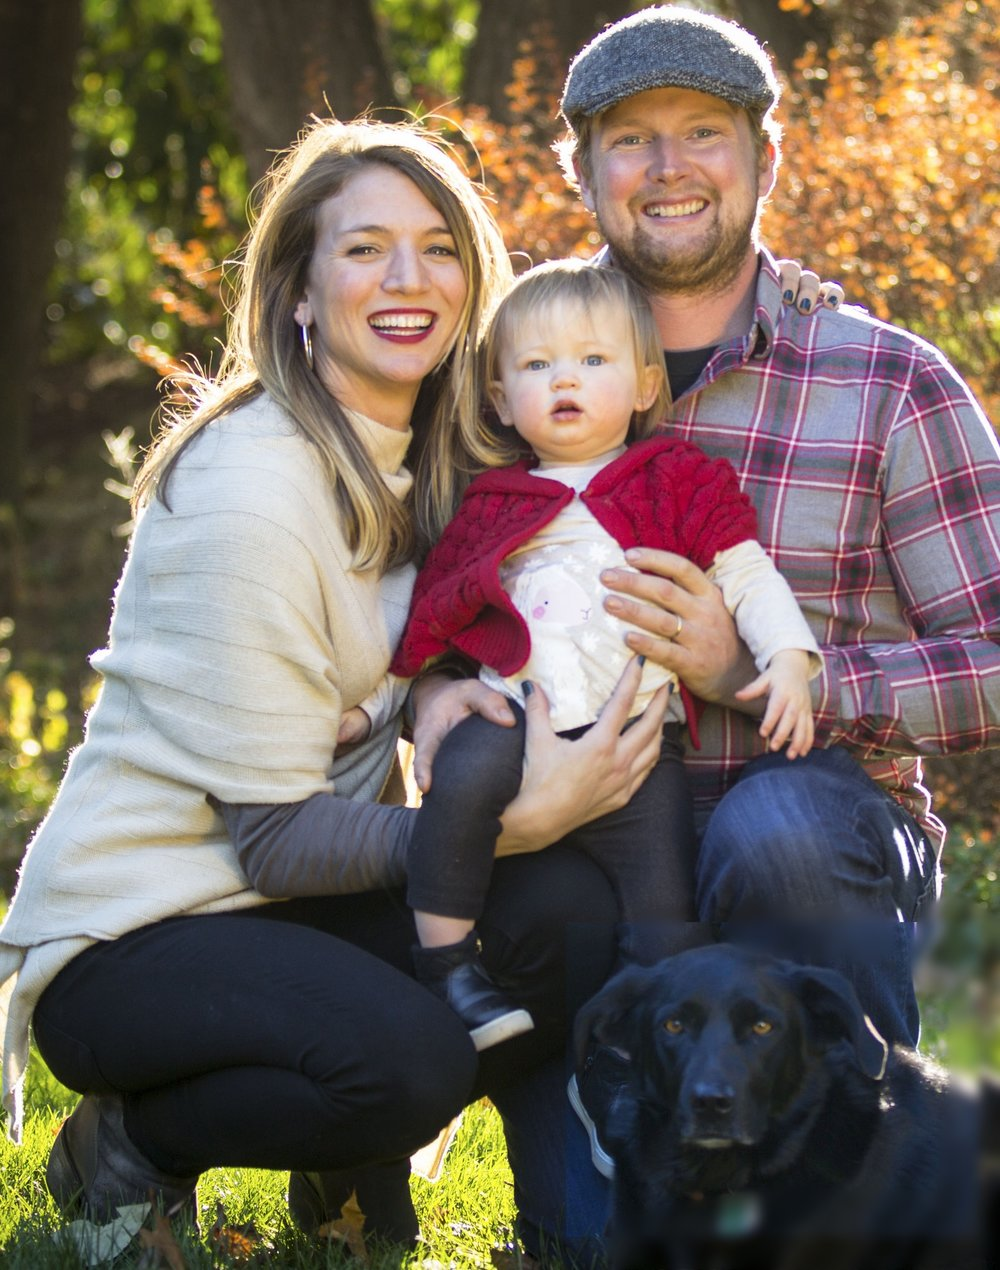 The Knox Family- Jon, Kim, Ginny & Rita